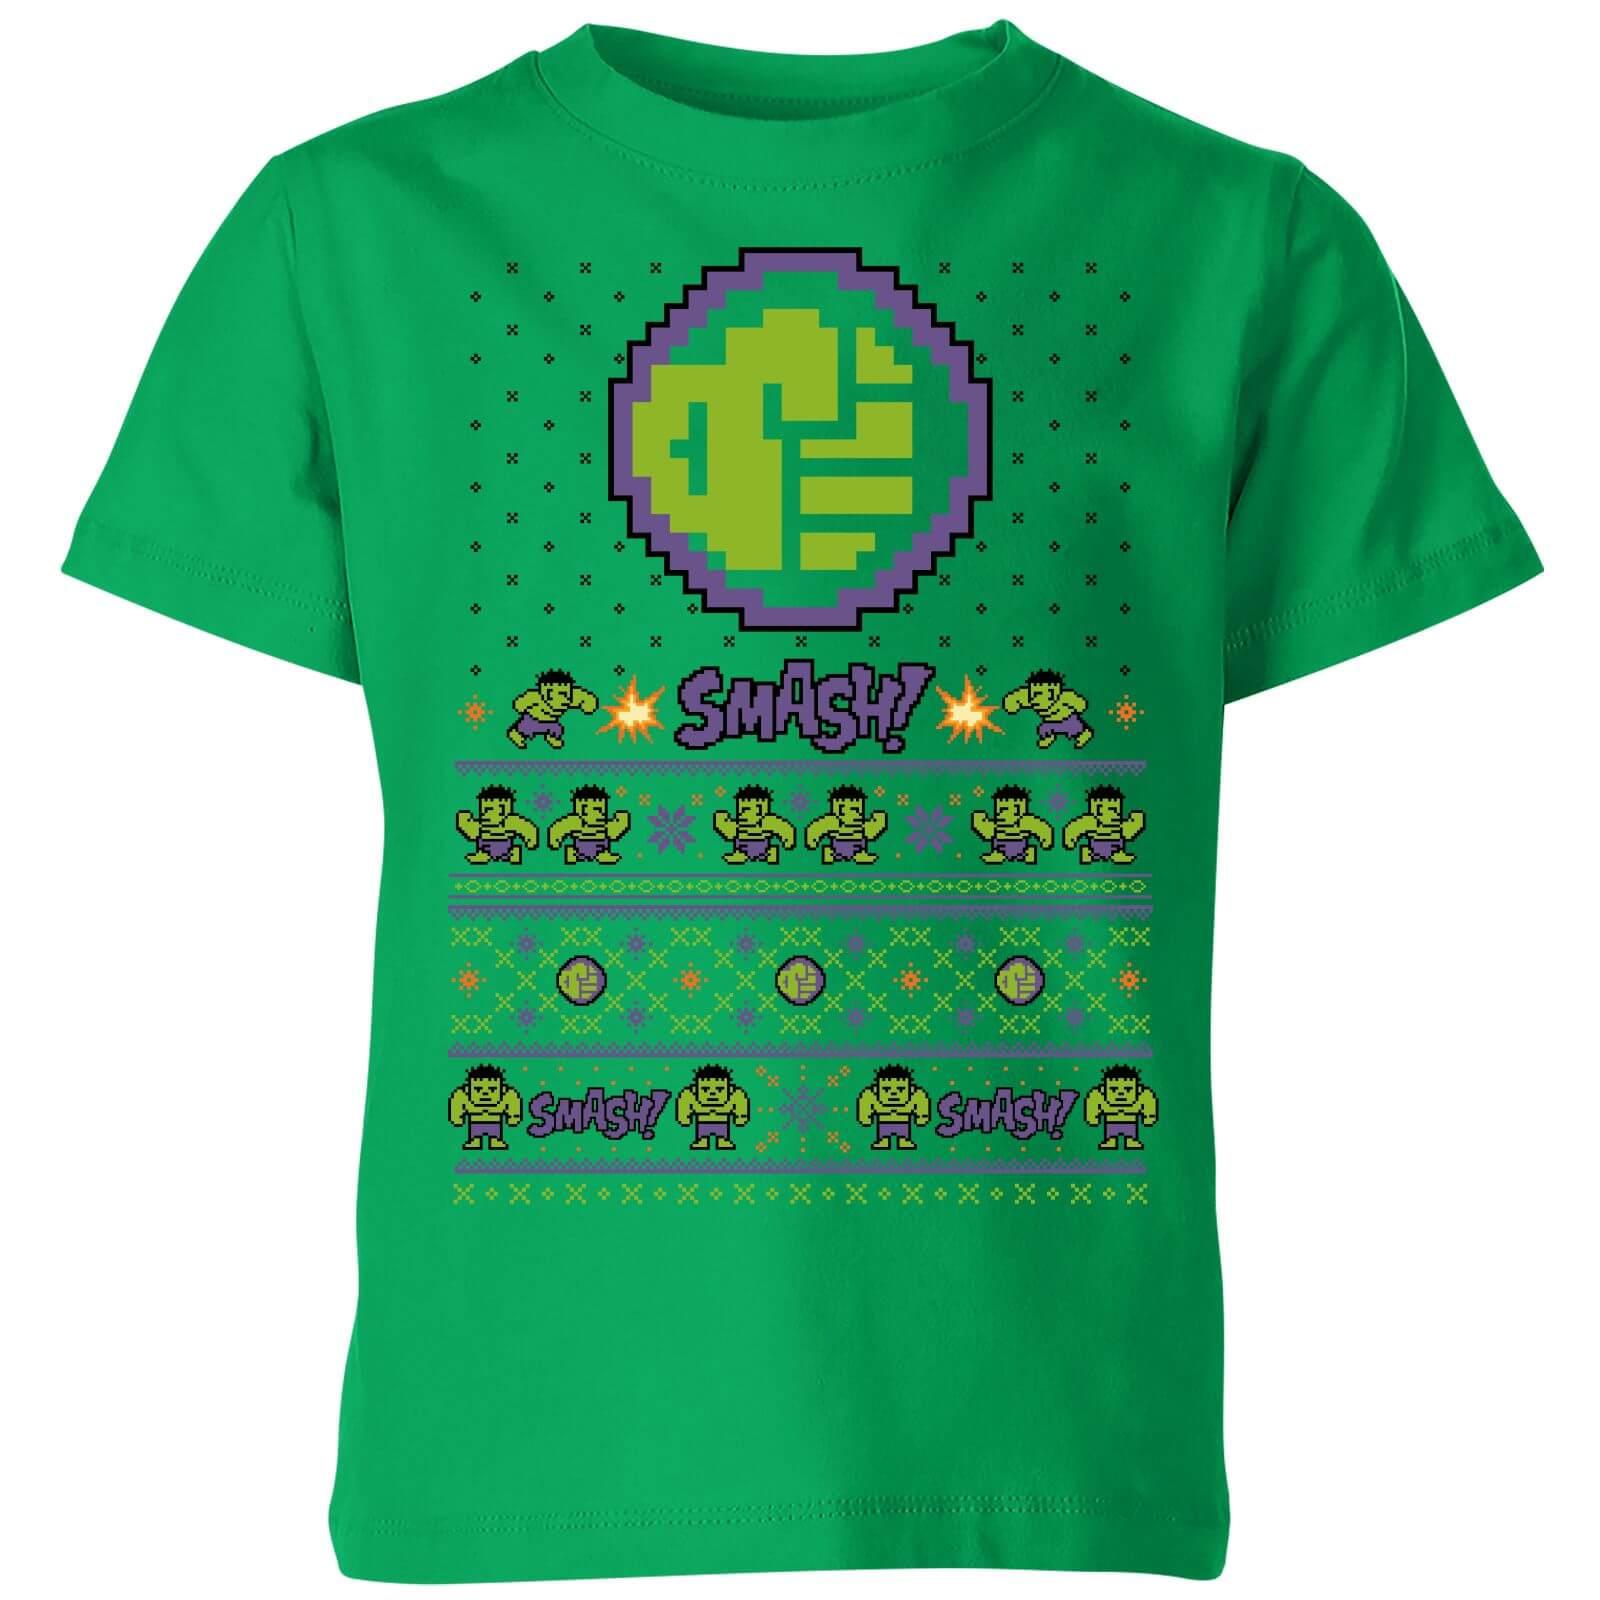 c7c5d713 Marvel Avengers Hulk Smash! Pixel Art Kids Christmas T-Shirt - Kelly Green